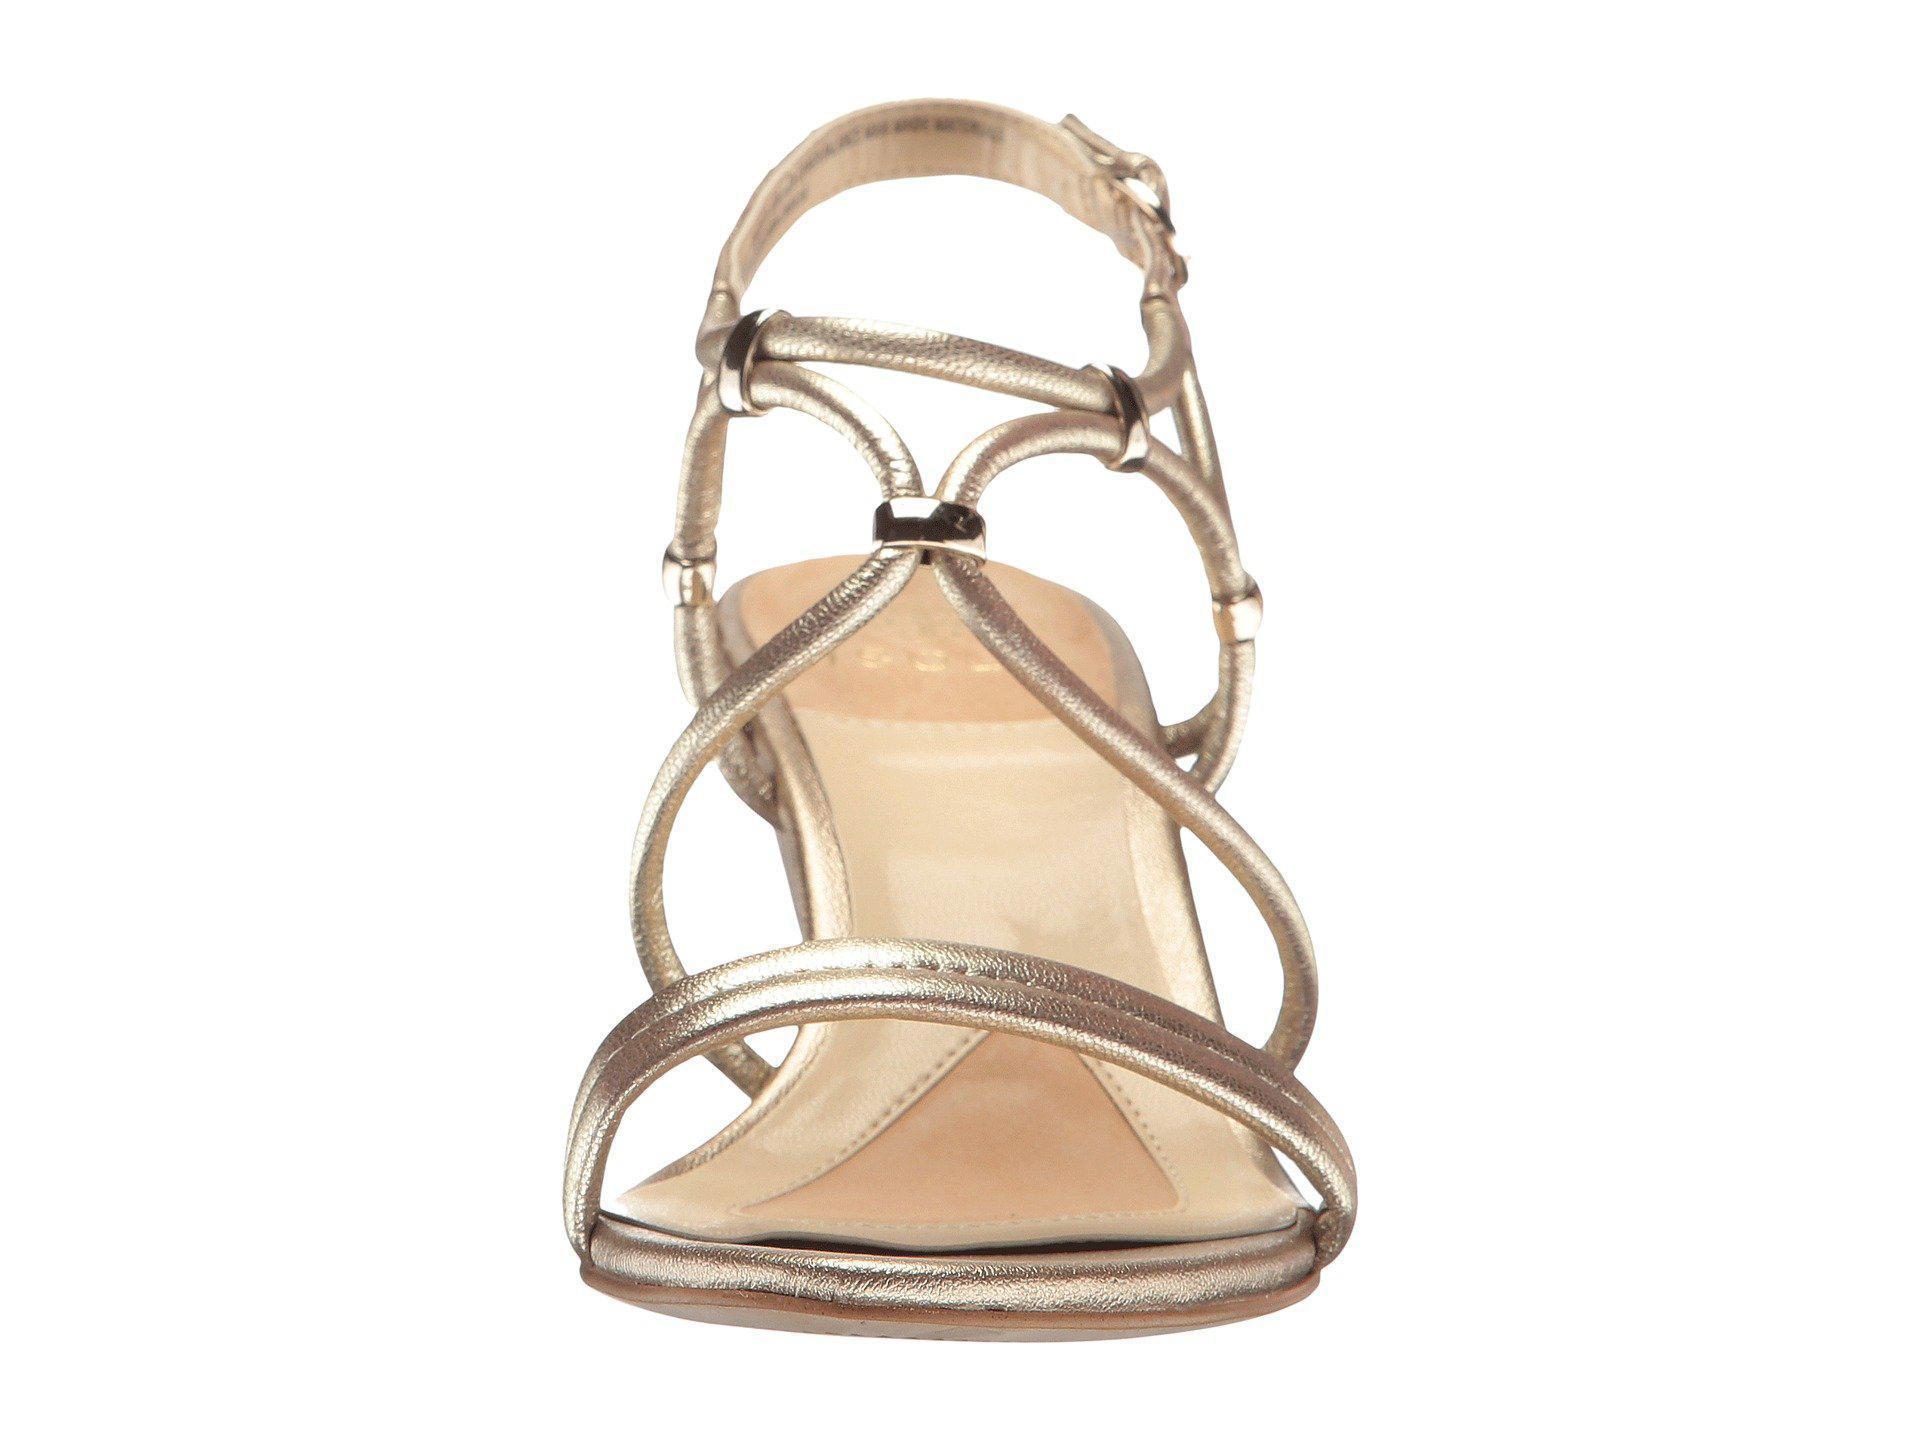 41c7f0f5bcf Isola - Farrah (satin Gold Grid Metallic) Women s Sandals - Lyst. View  fullscreen